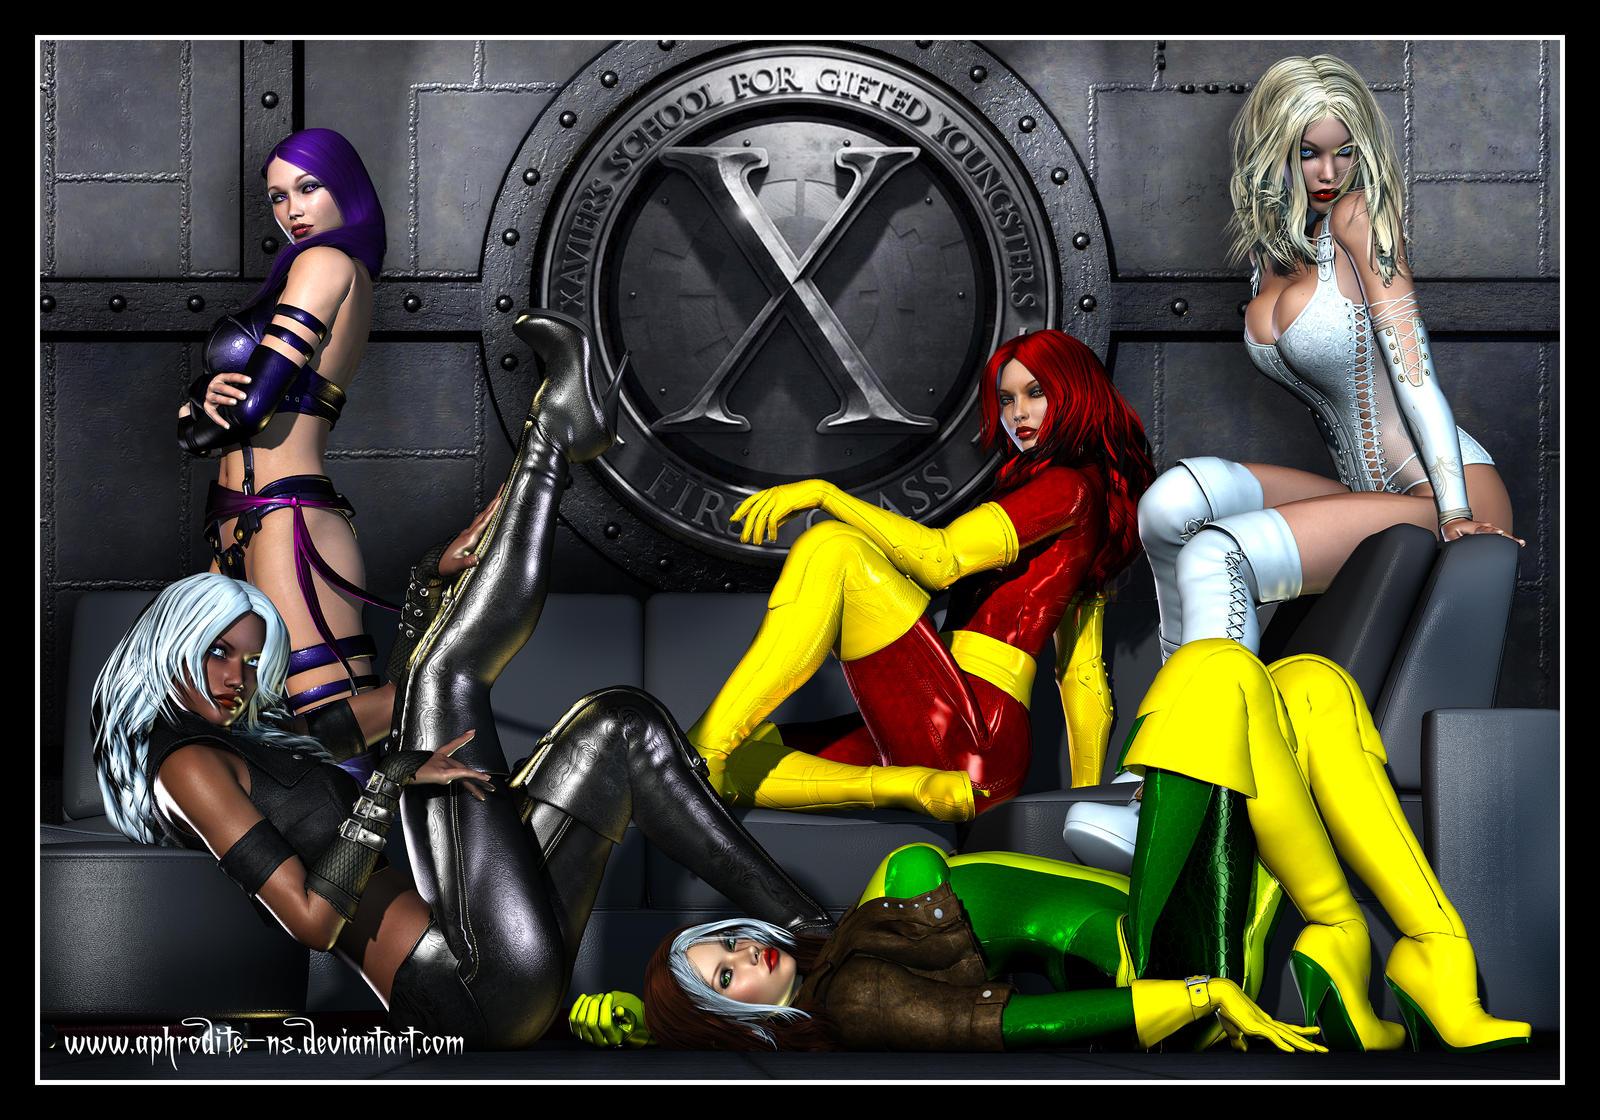 X-men women nude naked